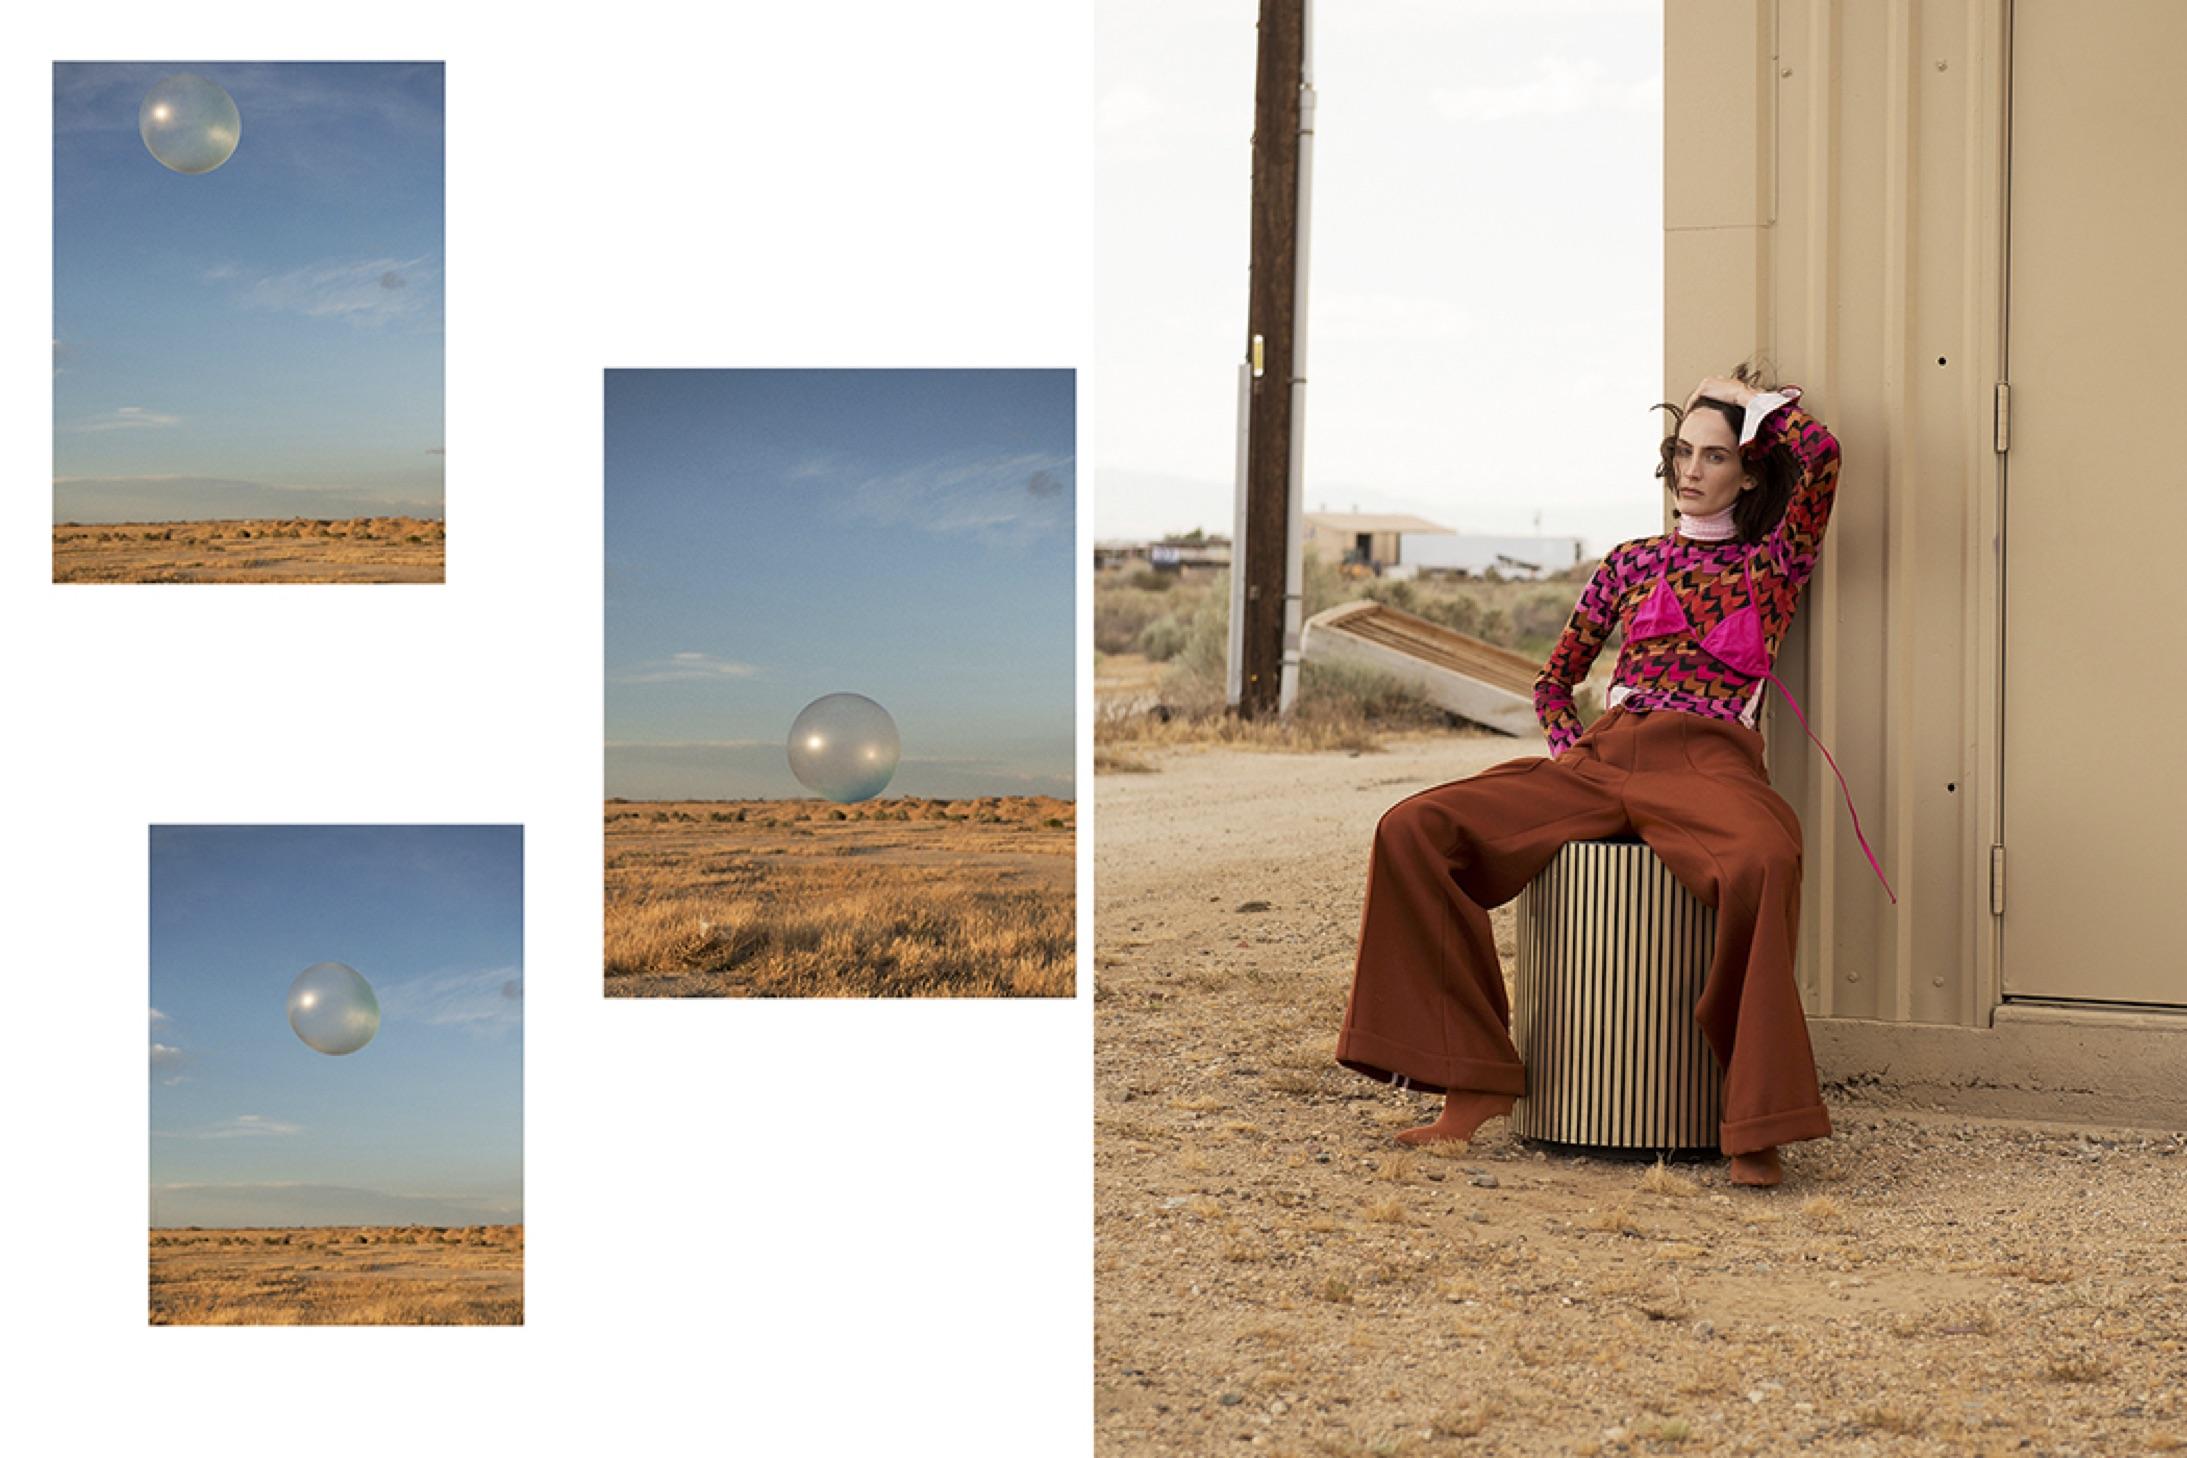 Follow me into the desert 3.jpg